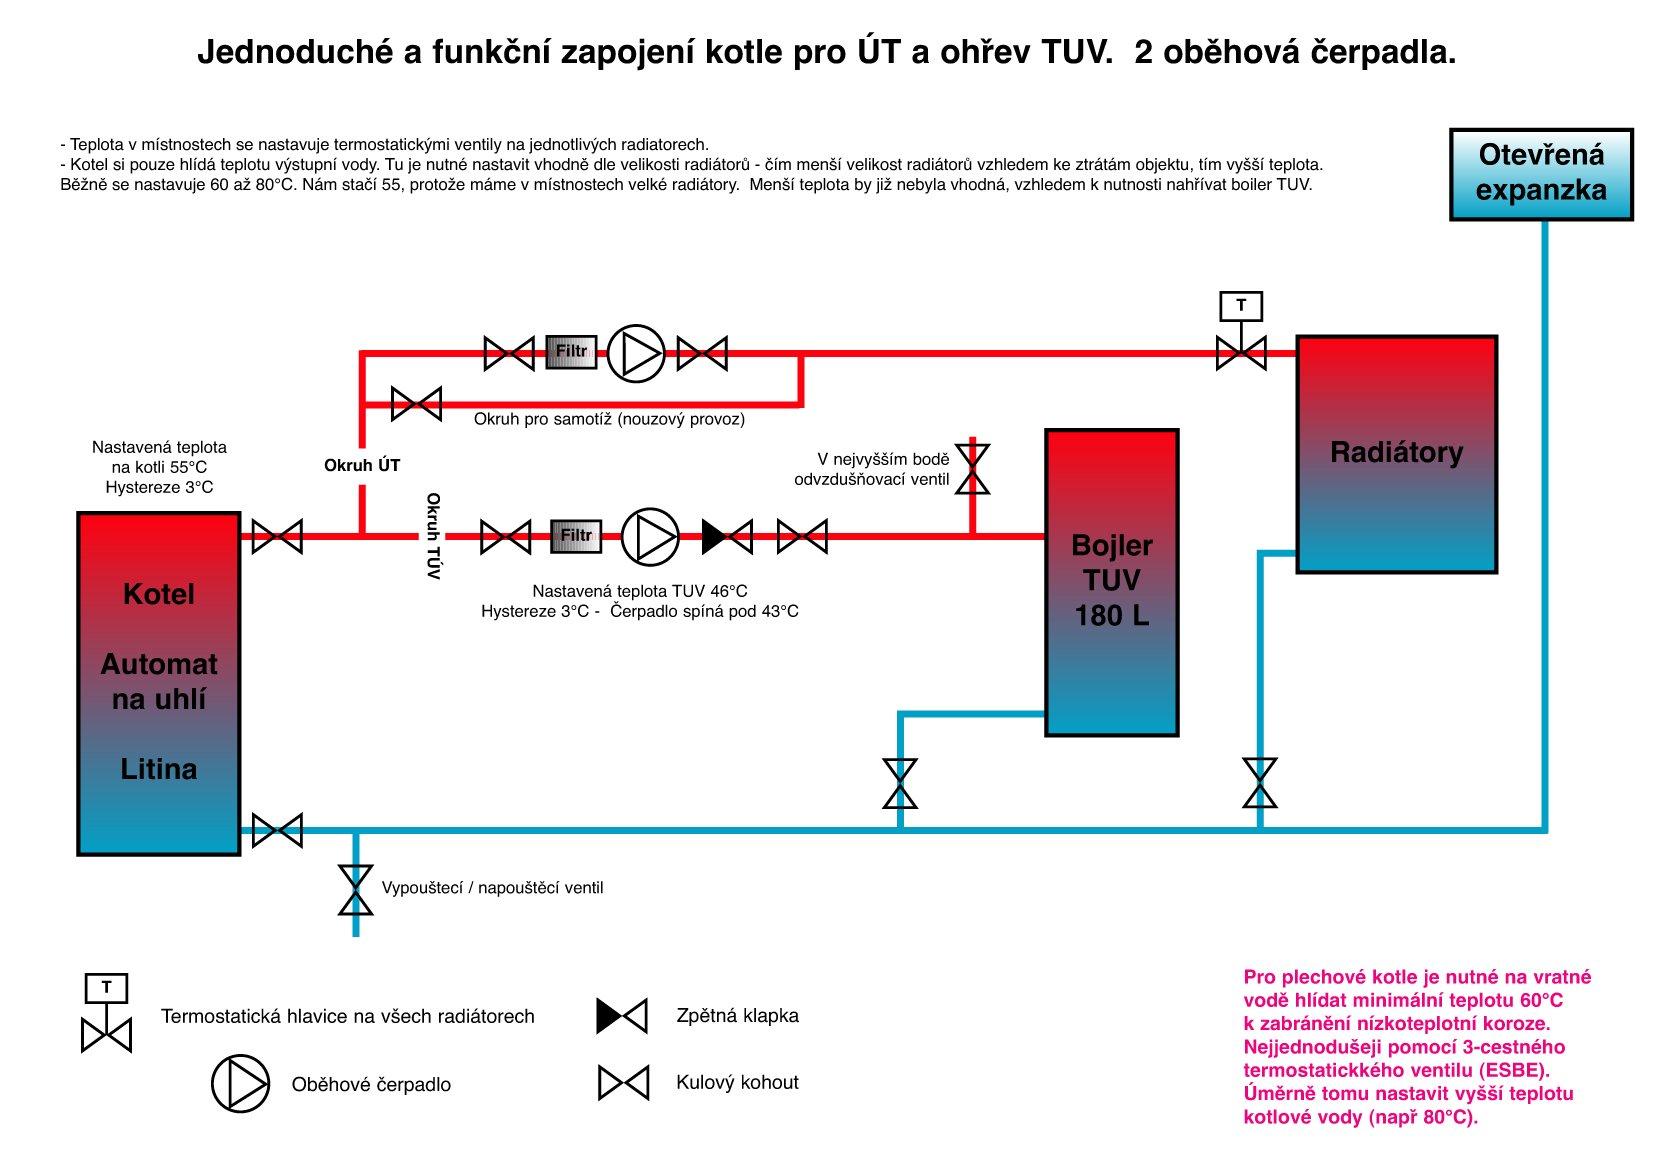 Hercules Duo - Diskuze TZB-info 4c1c3aea166